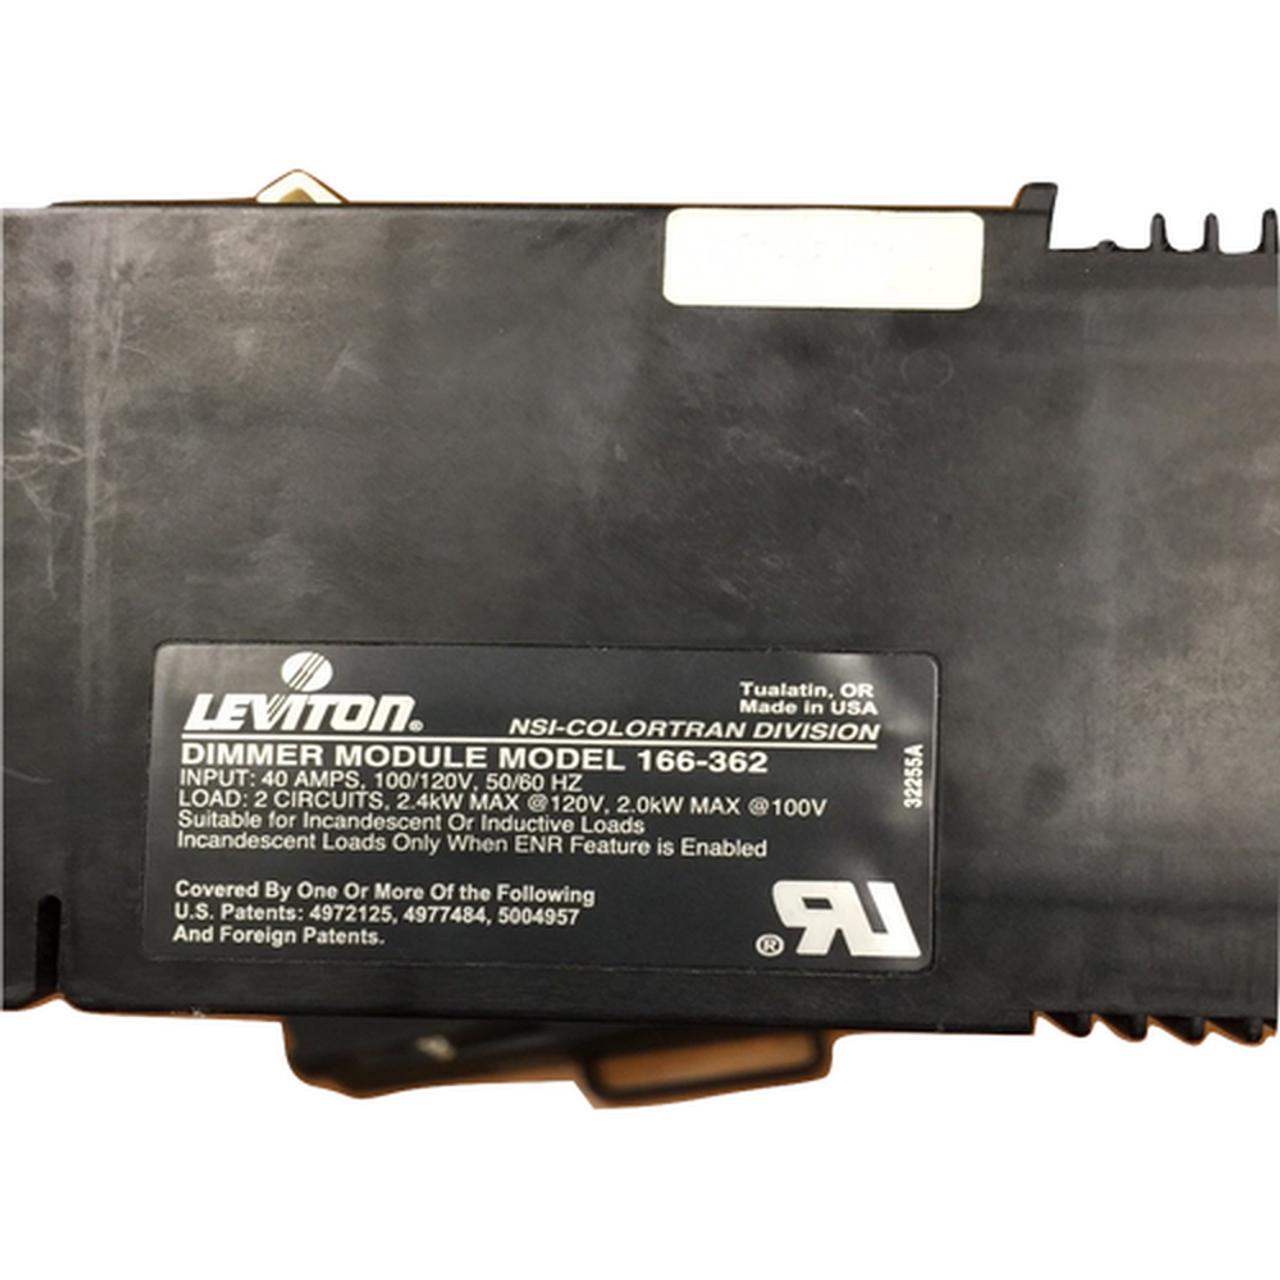 Leviton Colortran ENR Dimmer Module Model 166-362 (Topaz)